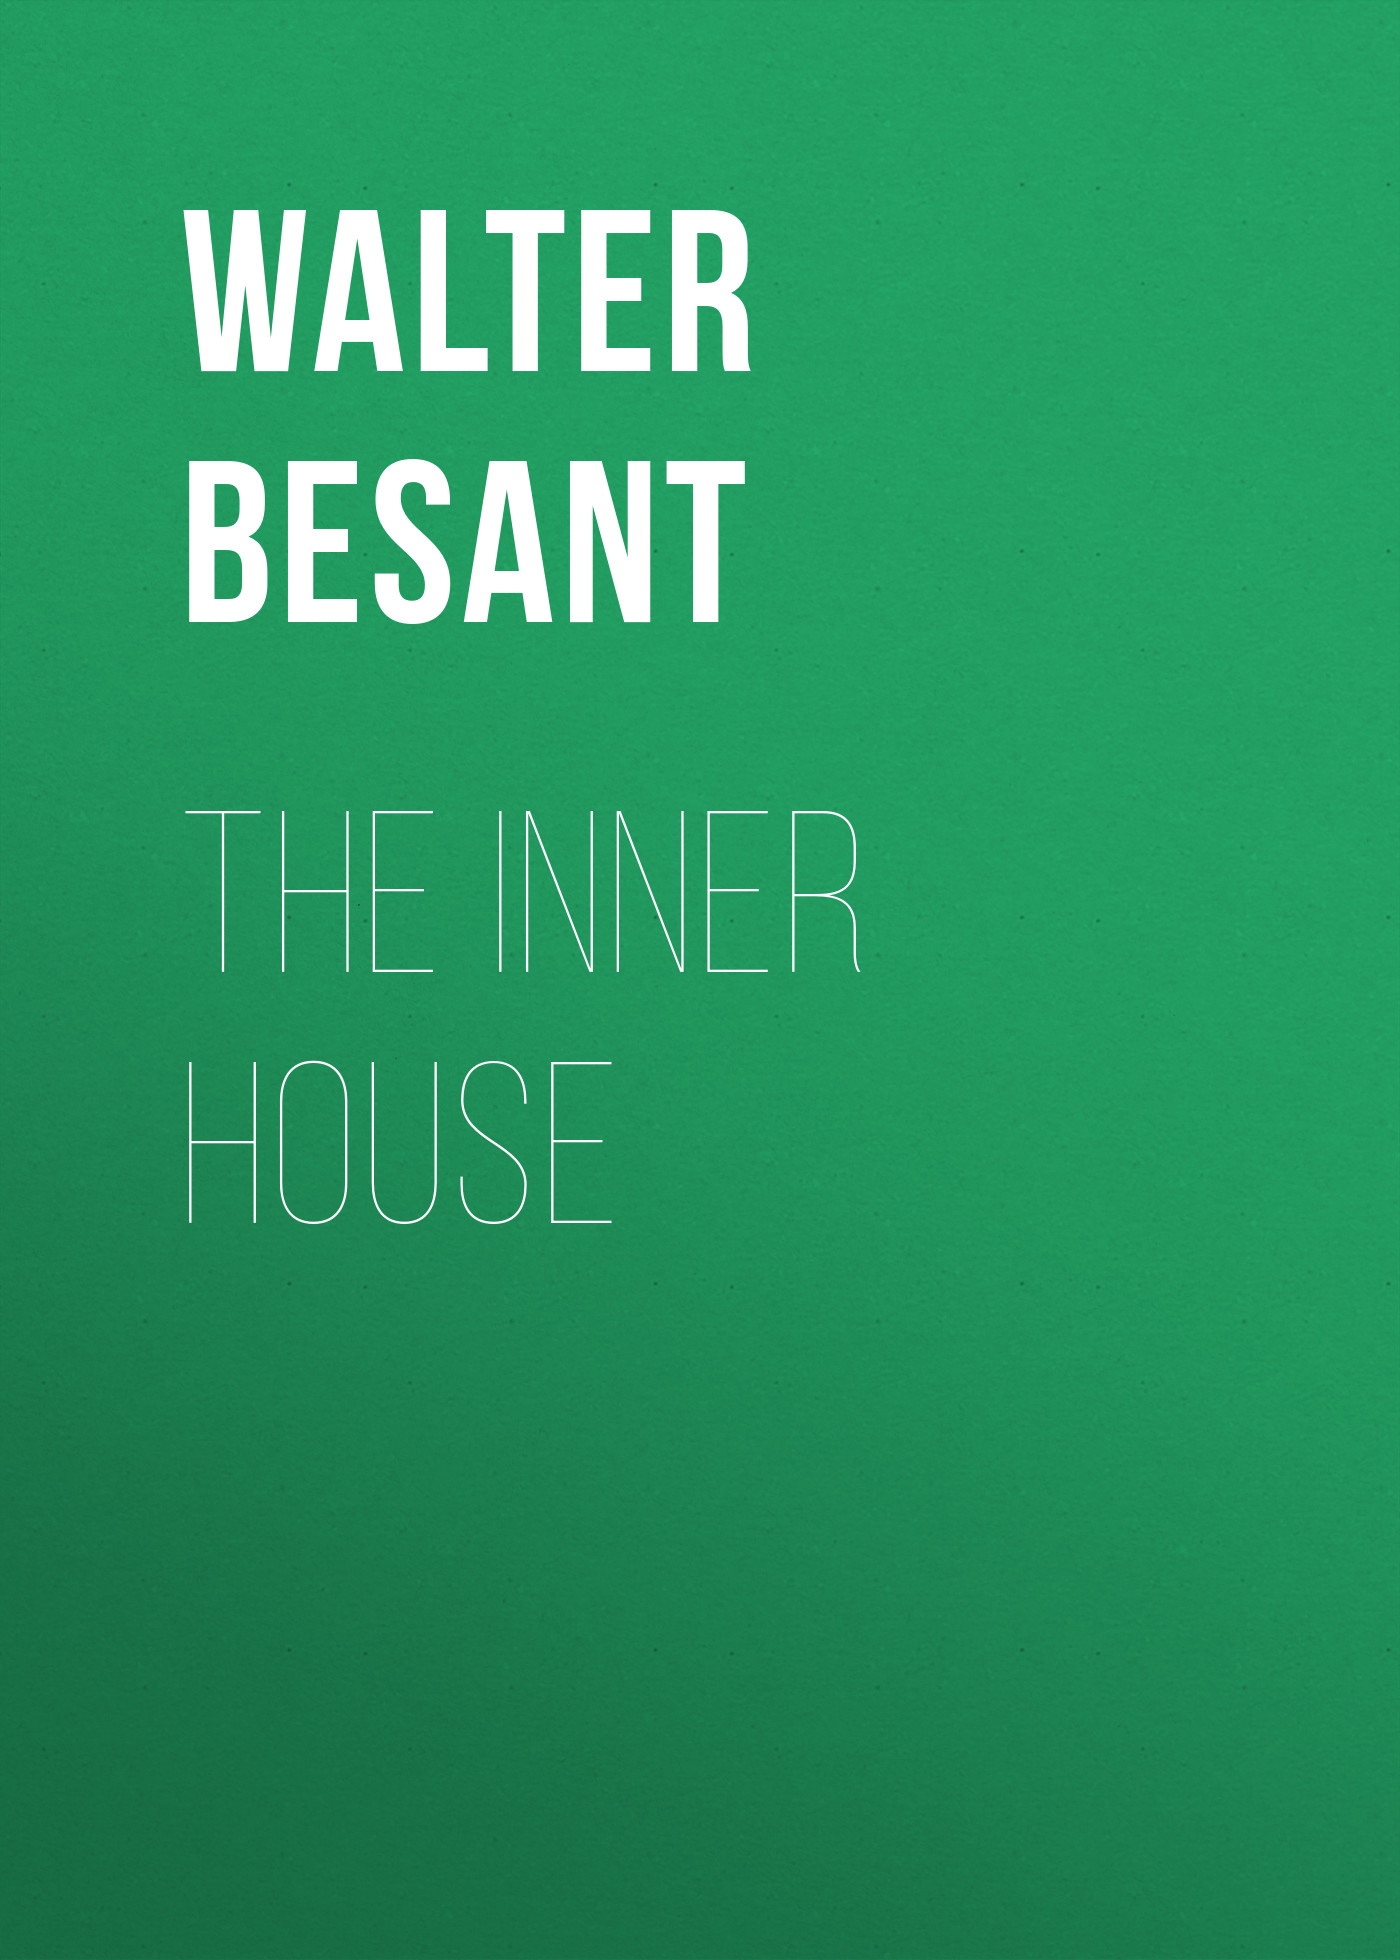 Walter Besant The inner house чайник со свистком 1 8 л regent tea 93 tea 25